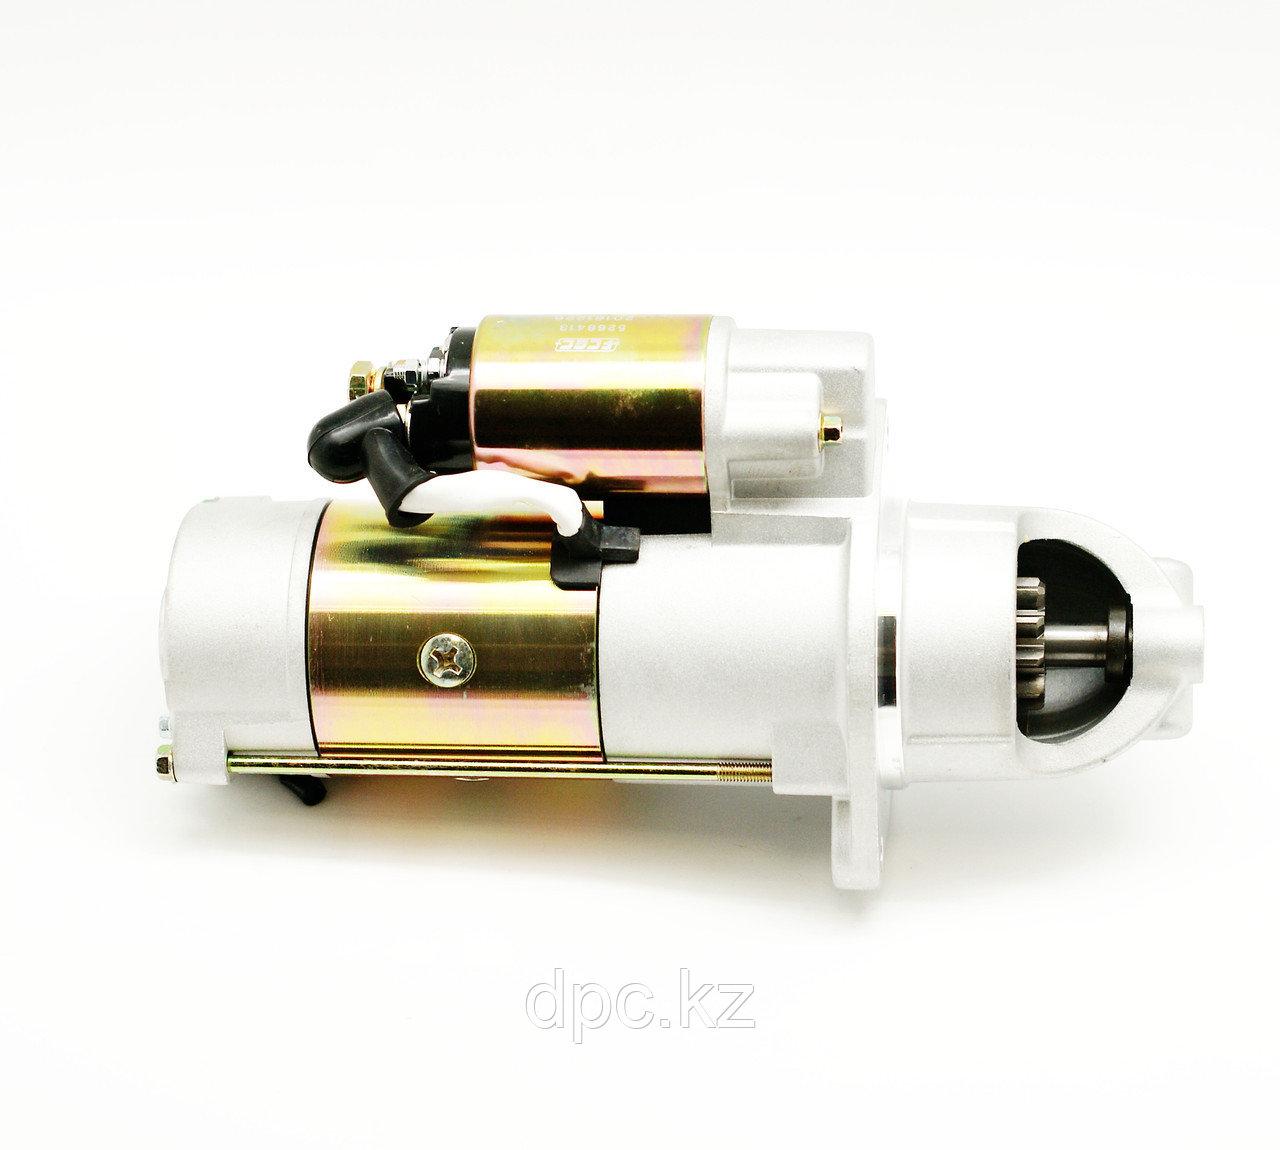 Стартер FCEC для двигателя Cummins ISF 3.8 5319202 5268413 5263841 4937470